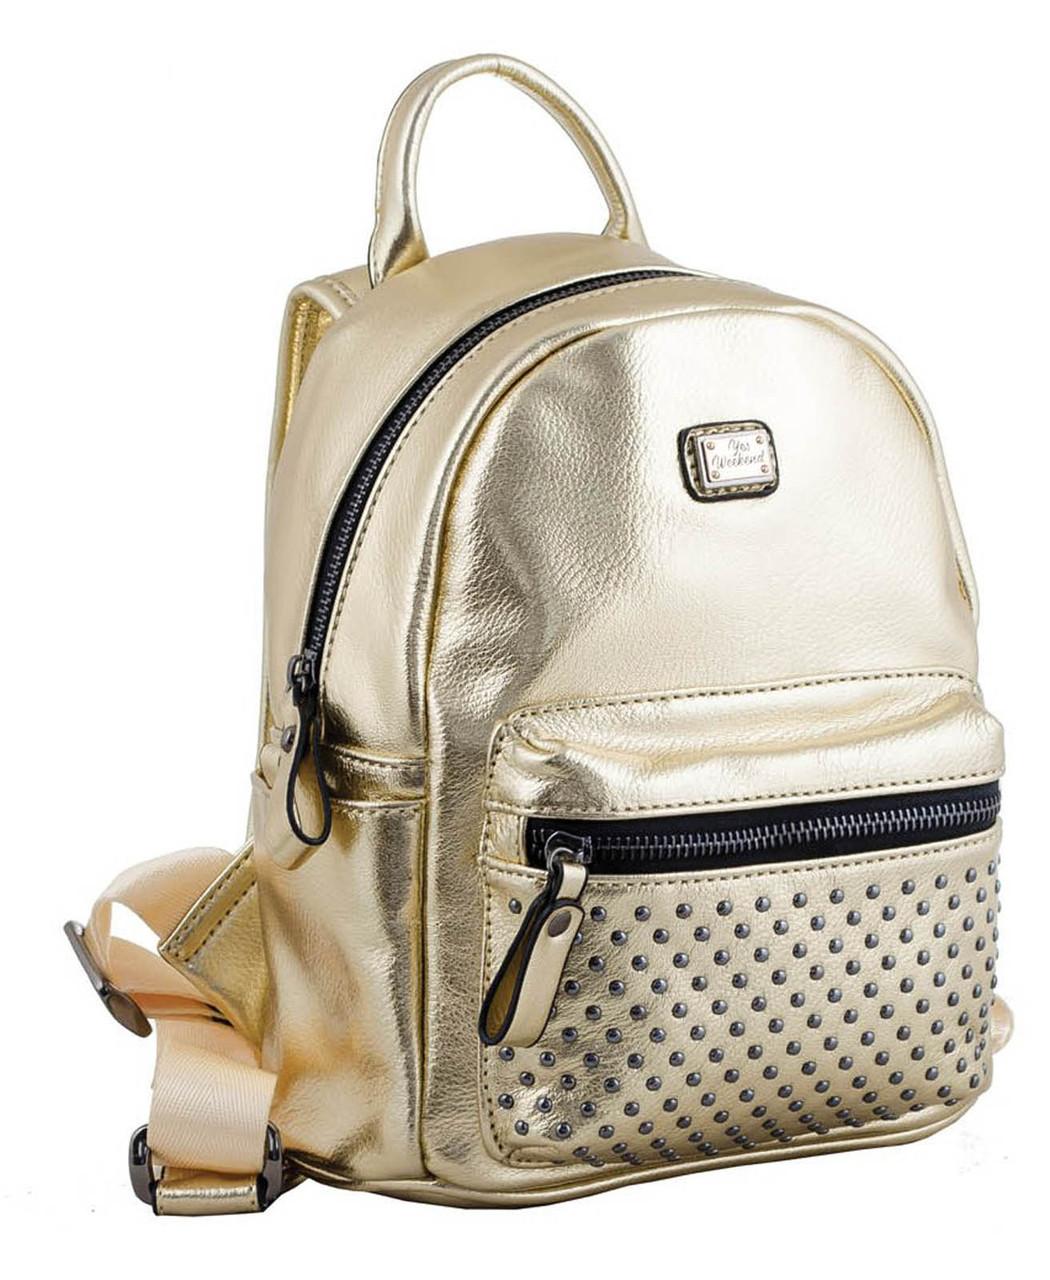 700a33ed48e1 Женская сумка-рюкзак из экокожи, 1 ВЕРЕСНЯ 553239 3 л - SUPERSUMKA интернет  магазин